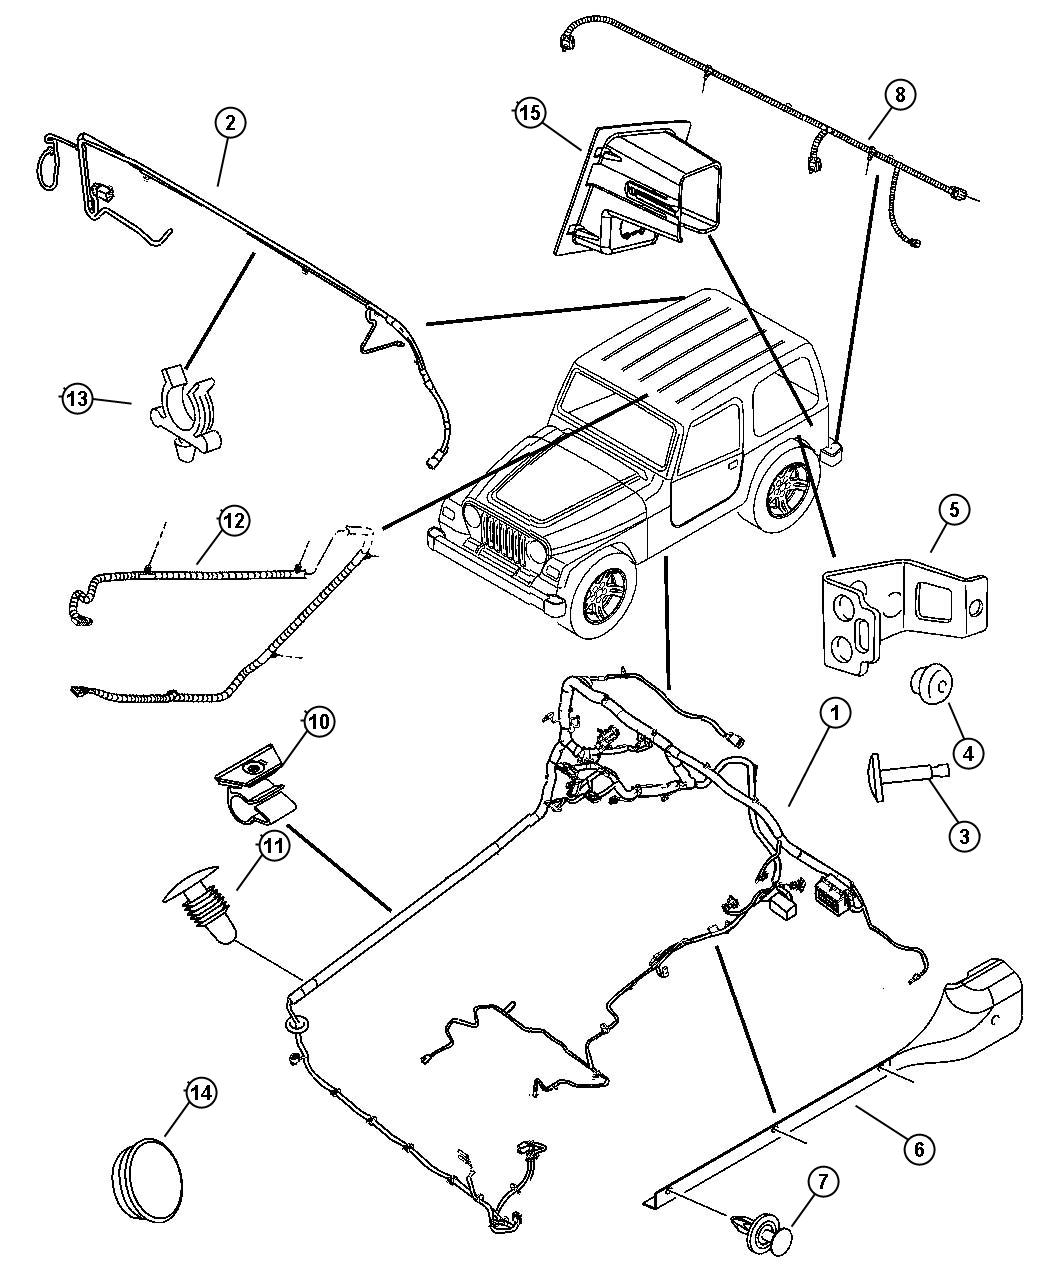 95 Jeep Cherokee Ac Diagram - Wiring Diagrams List Ac Wiring Diagram Jeep Wrangler on